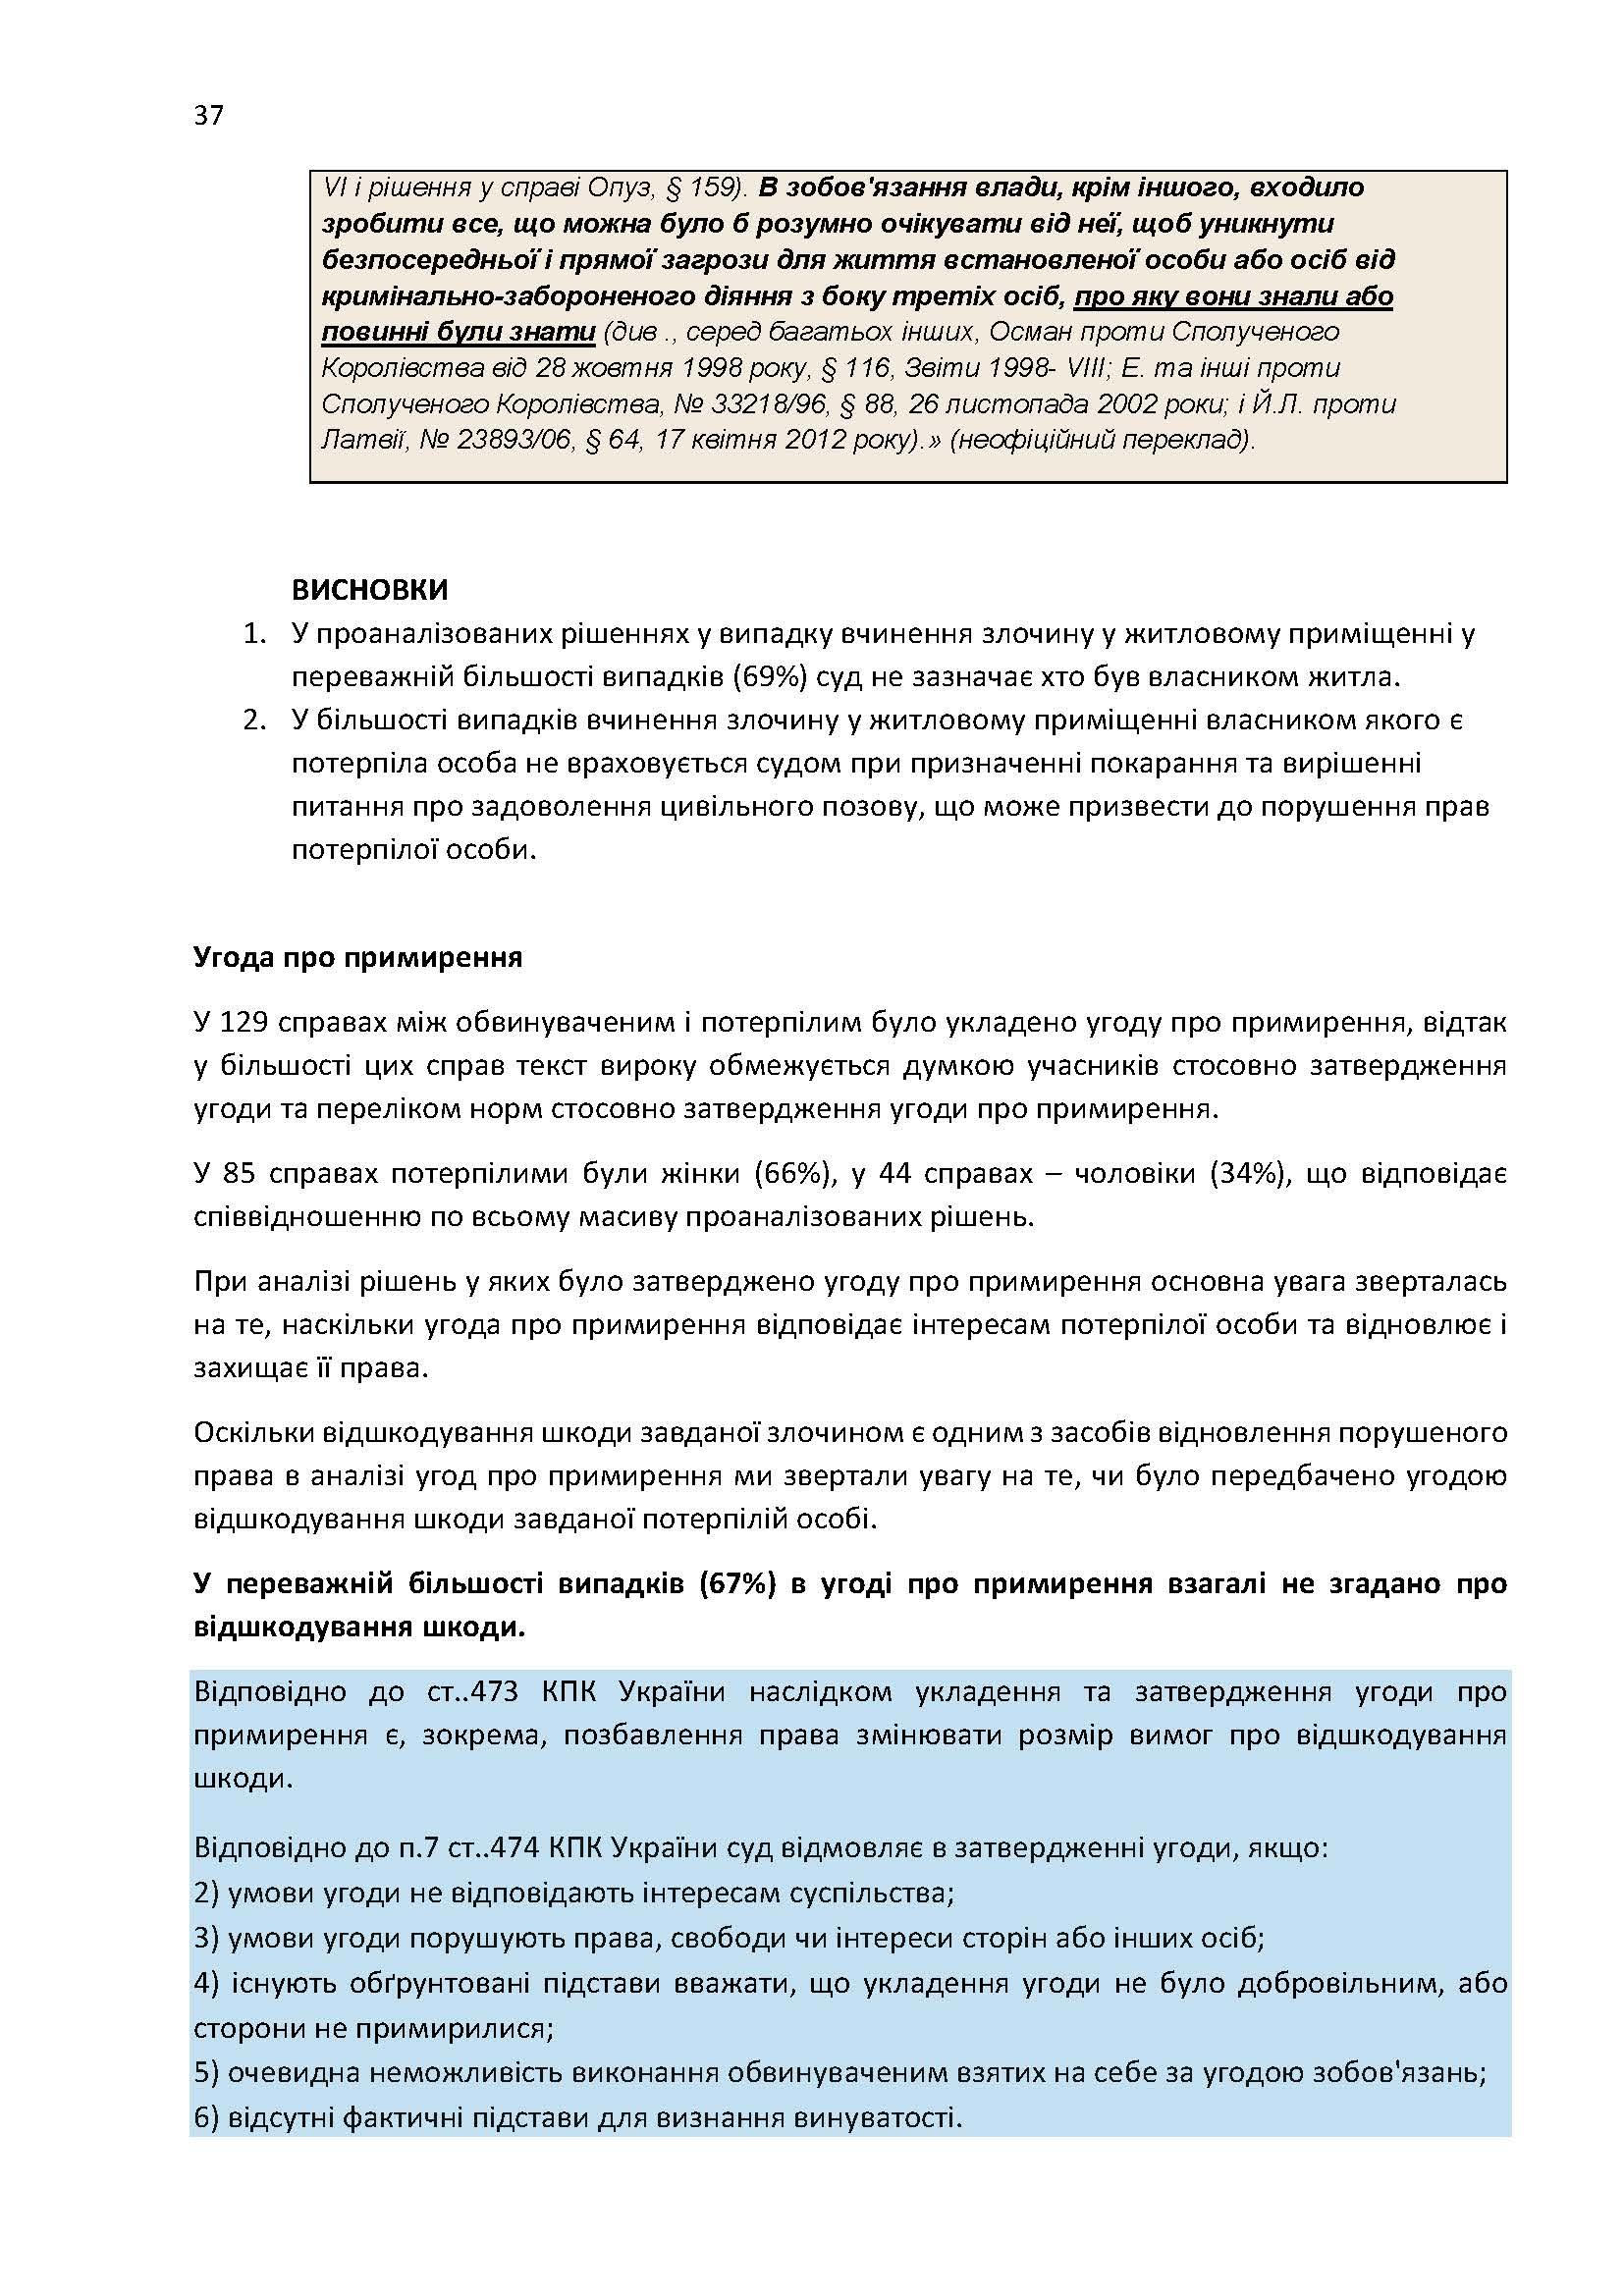 Draft Report monitoring print USAID_Страница_37